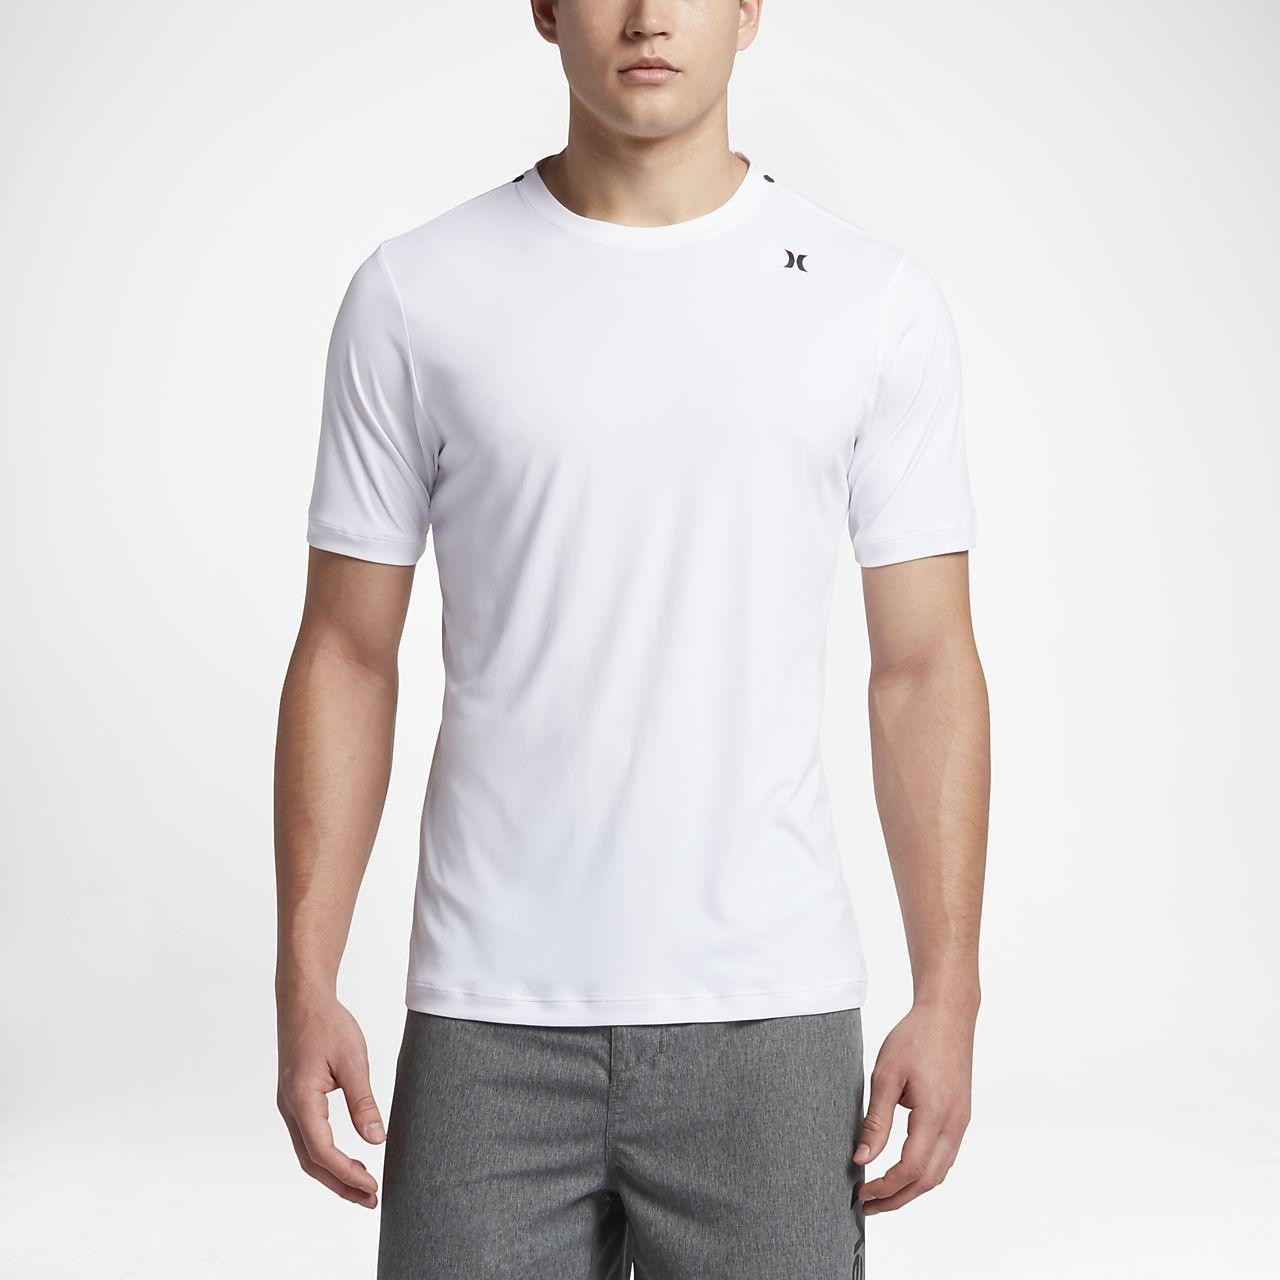 nike quick dry t shirt